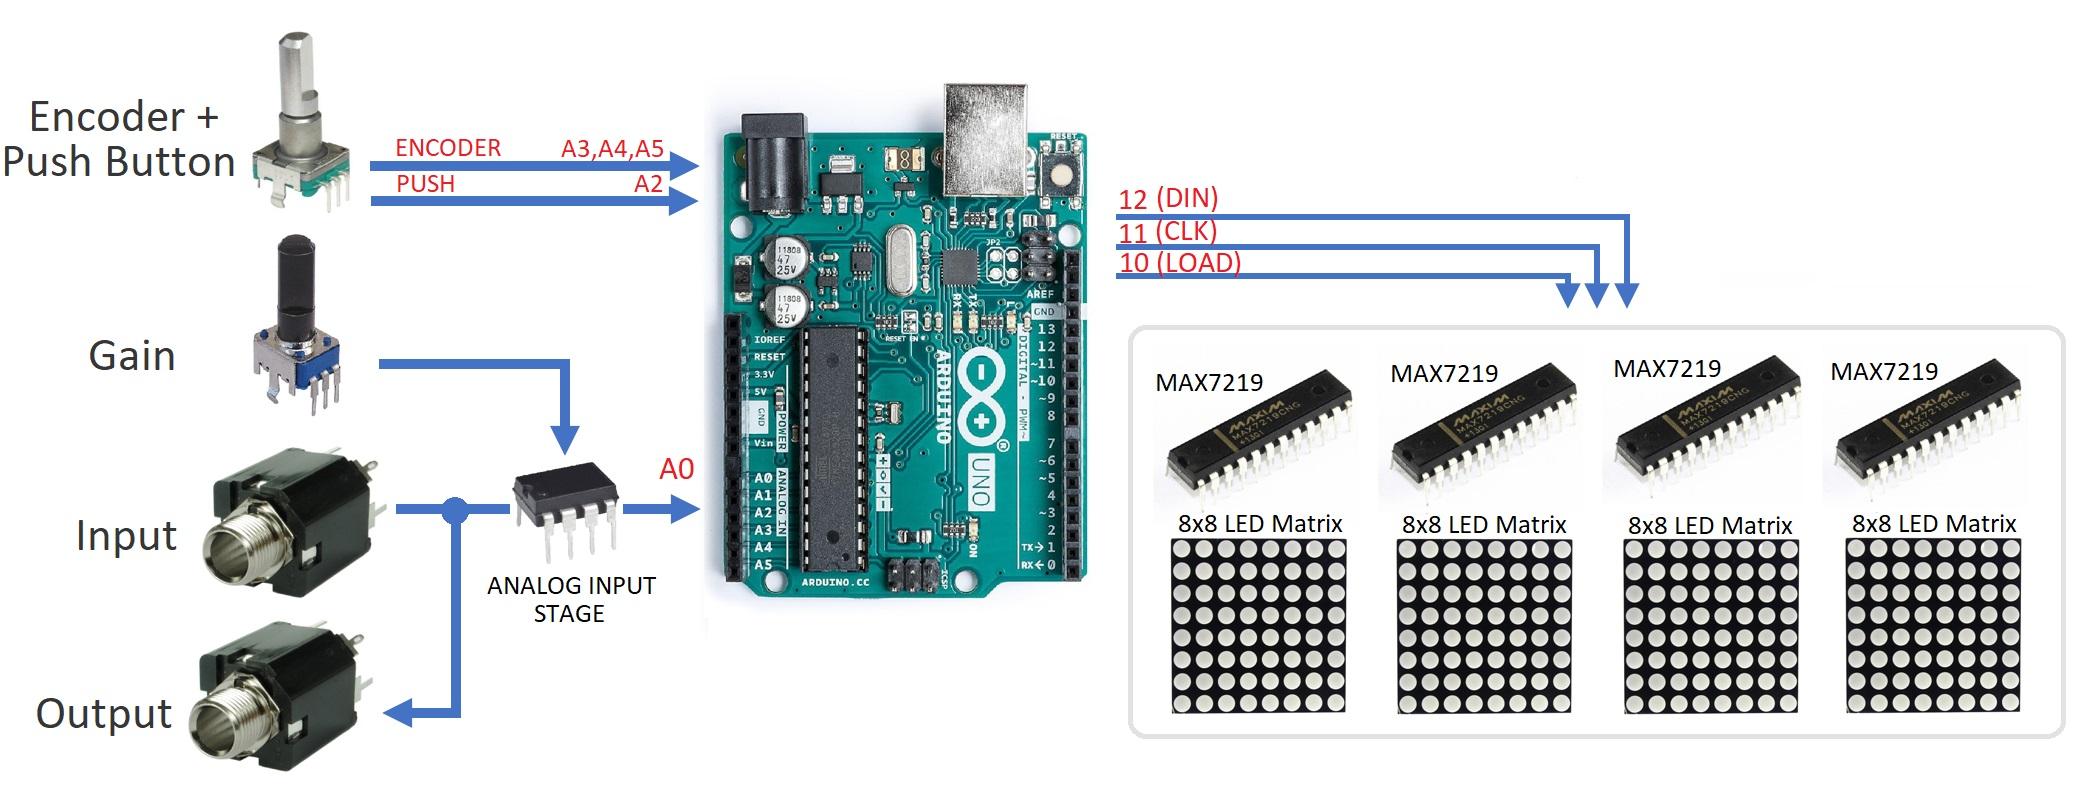 hardware-configuration.jpg